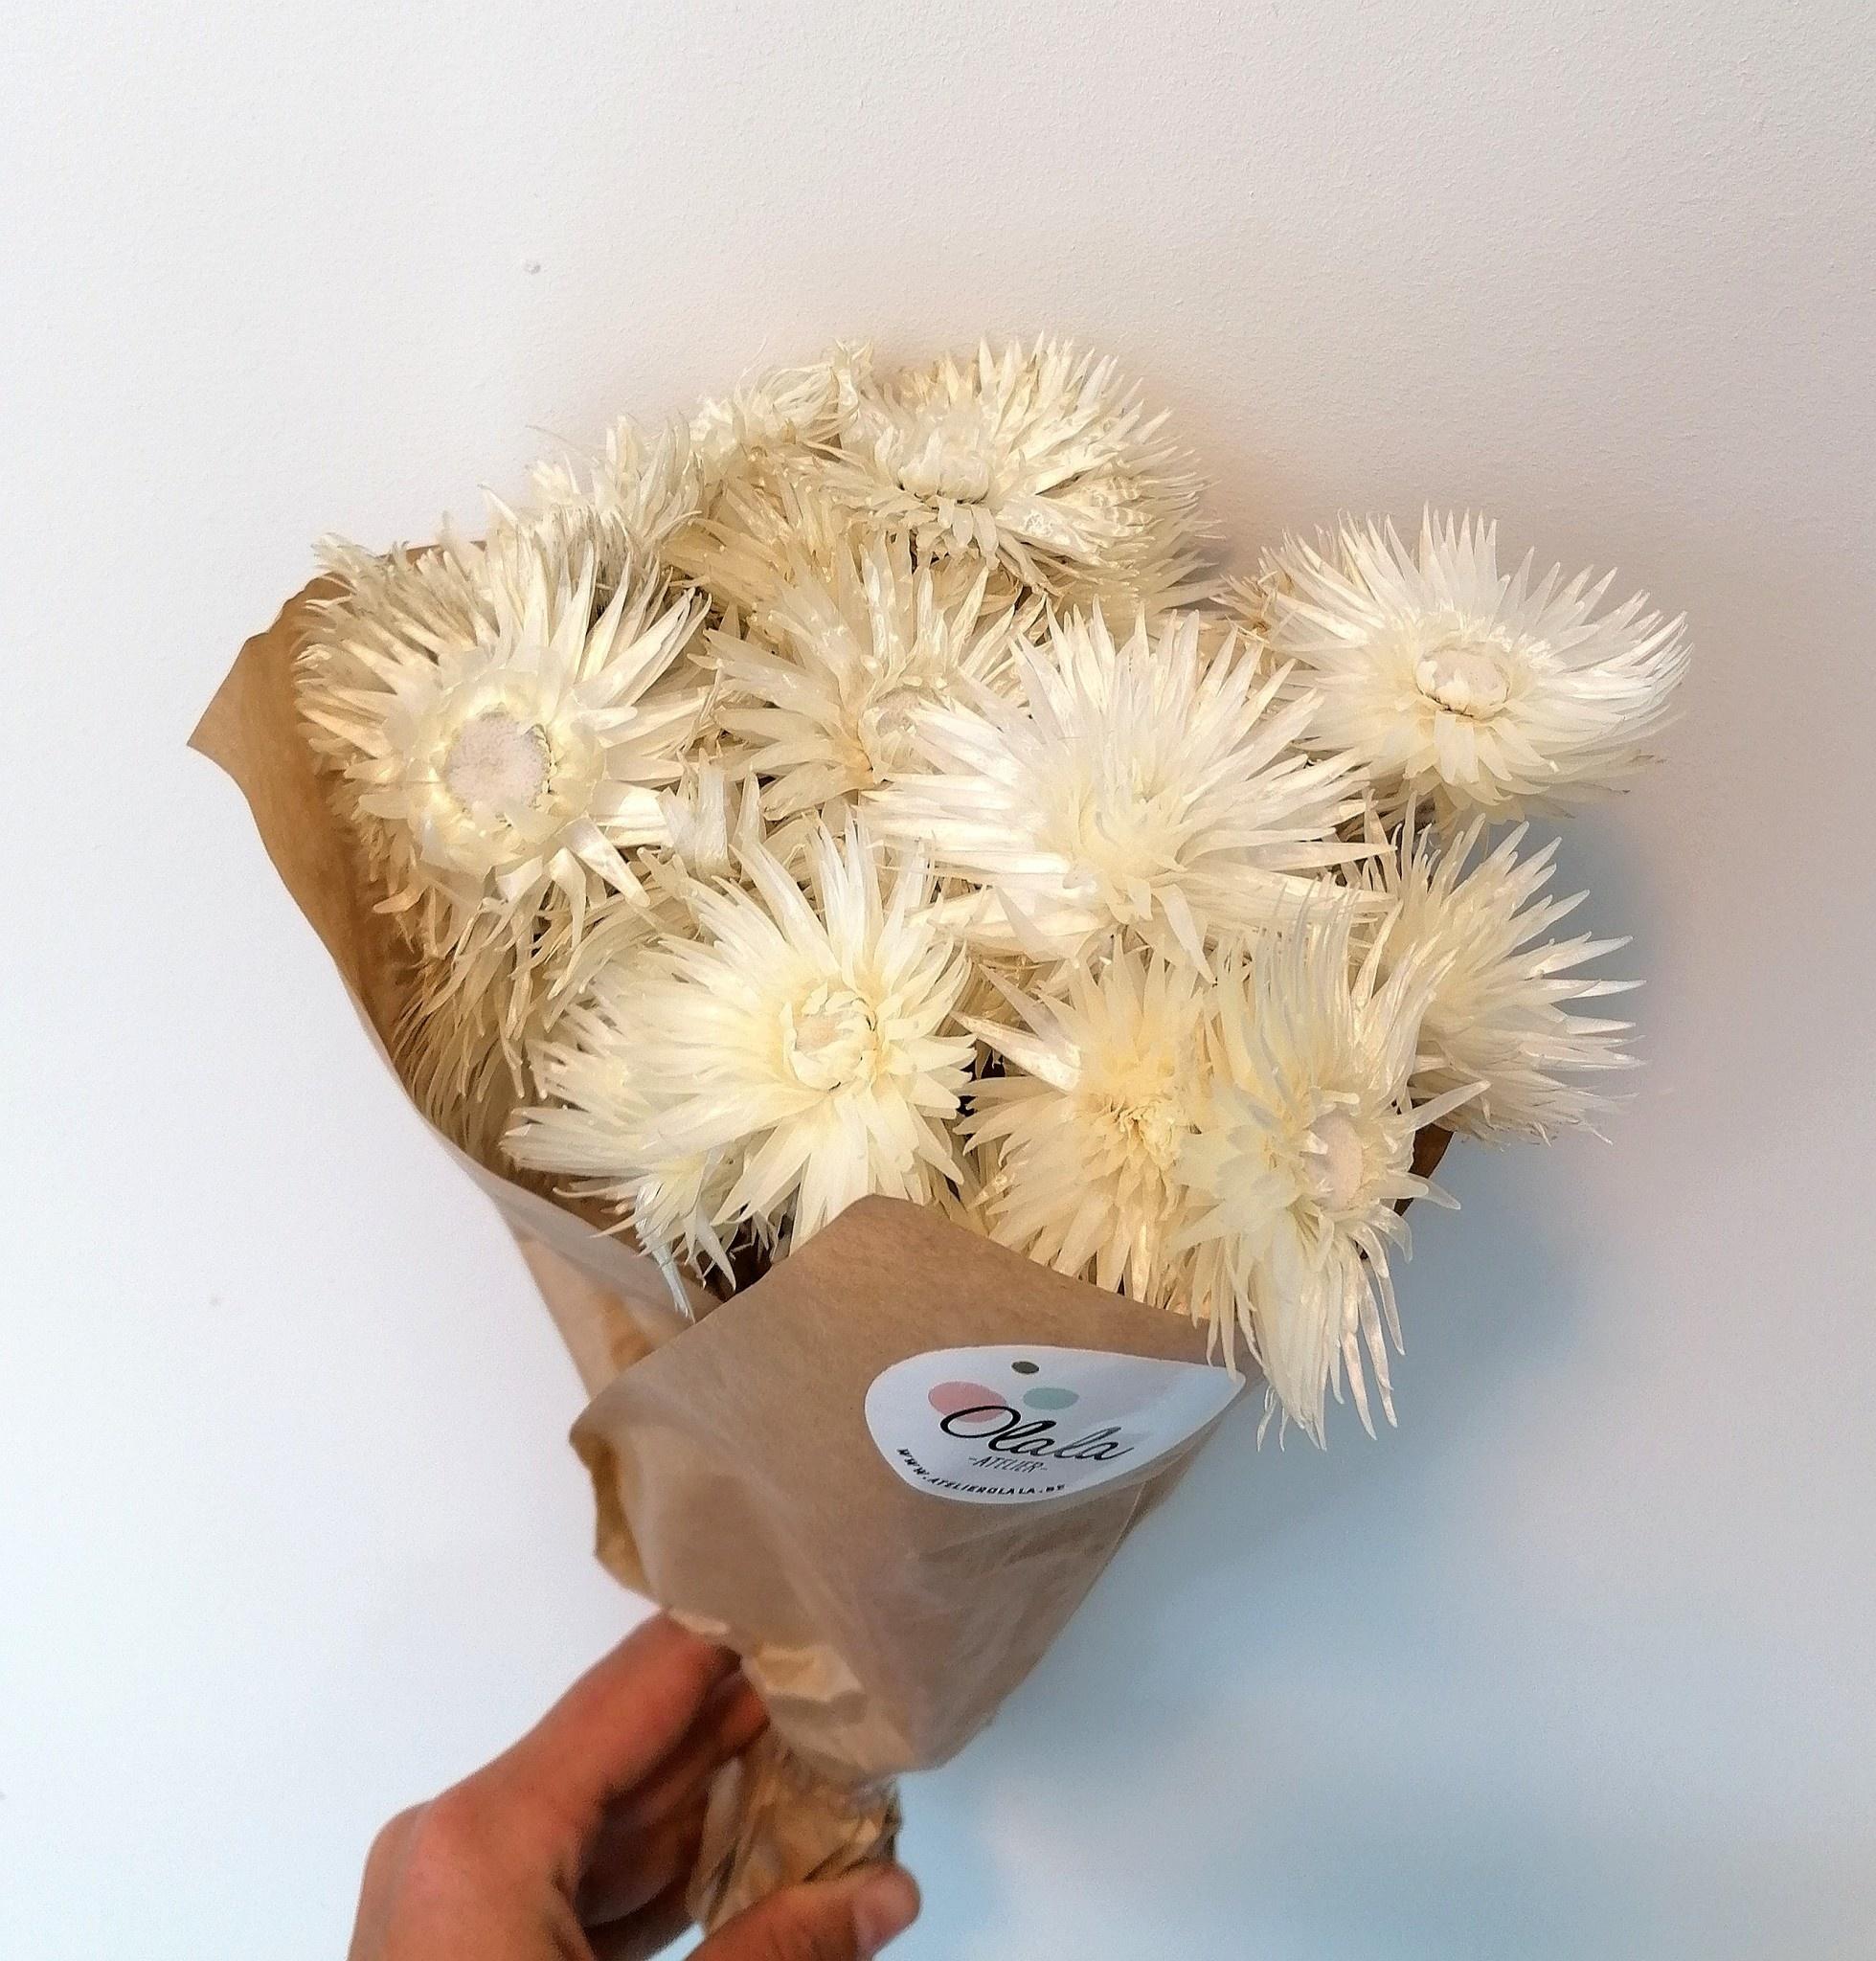 Droogboeket Kaapse Bloemen Wit-1